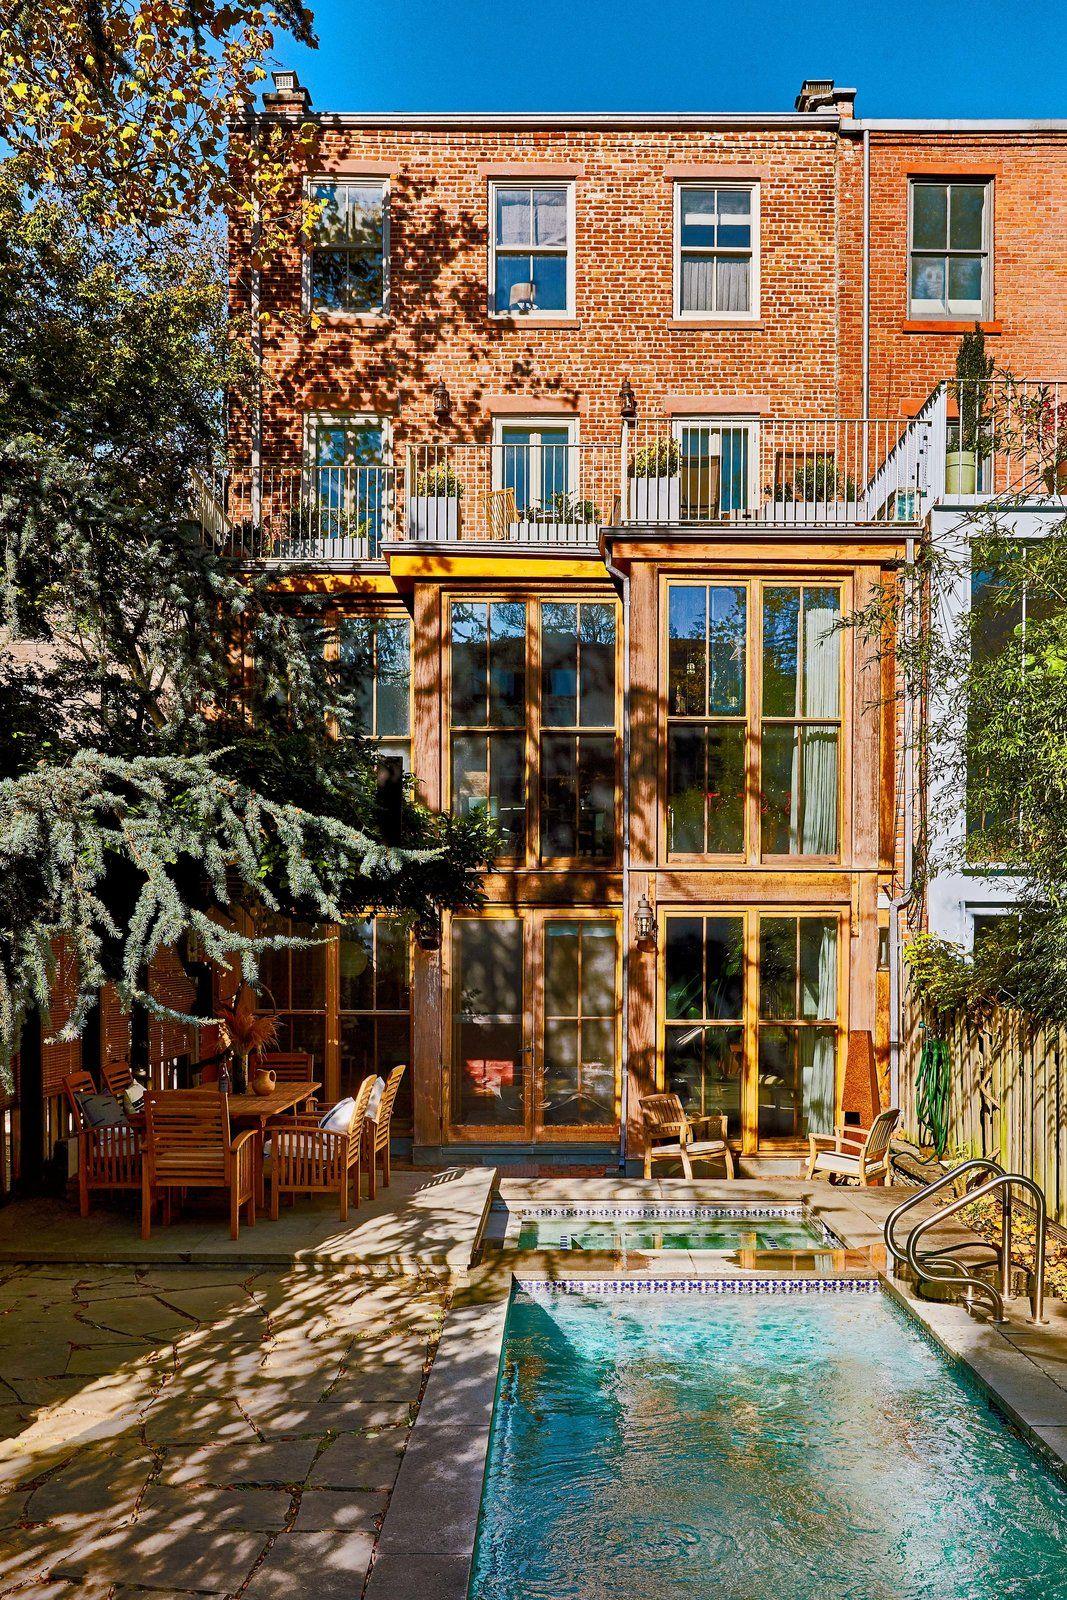 Norah Jones S Cobble Hill Home For Sale In 2020 Brooklyn House Townhouse Norah Jones